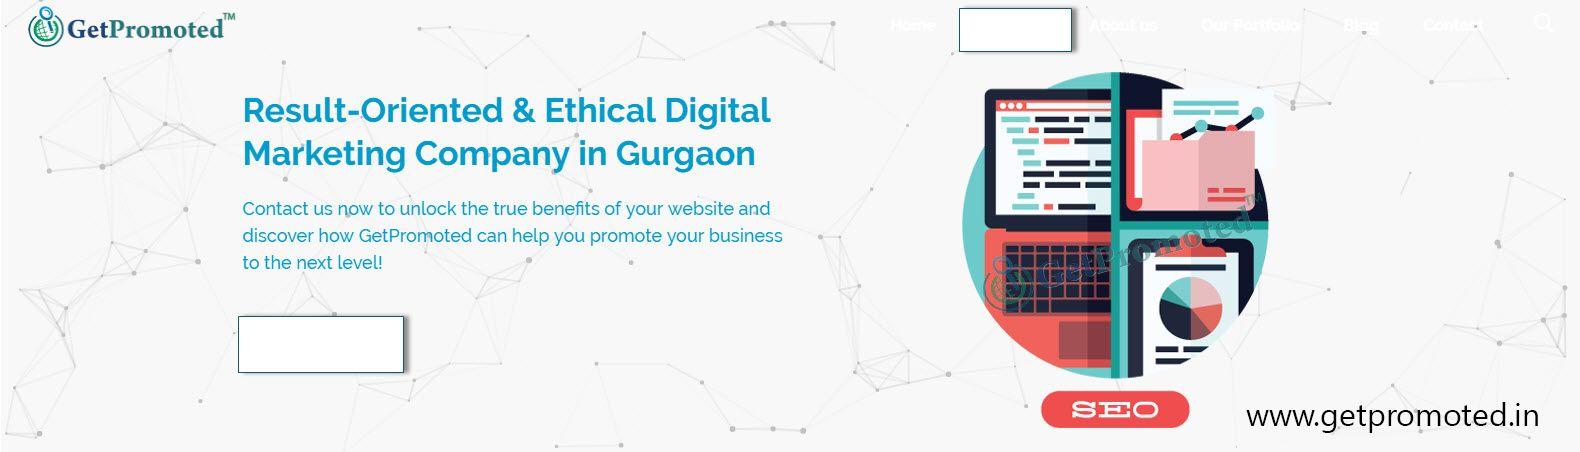 Getpromoted Web Design Development For Companies In India Web Design Digital Marketing Company Design Development